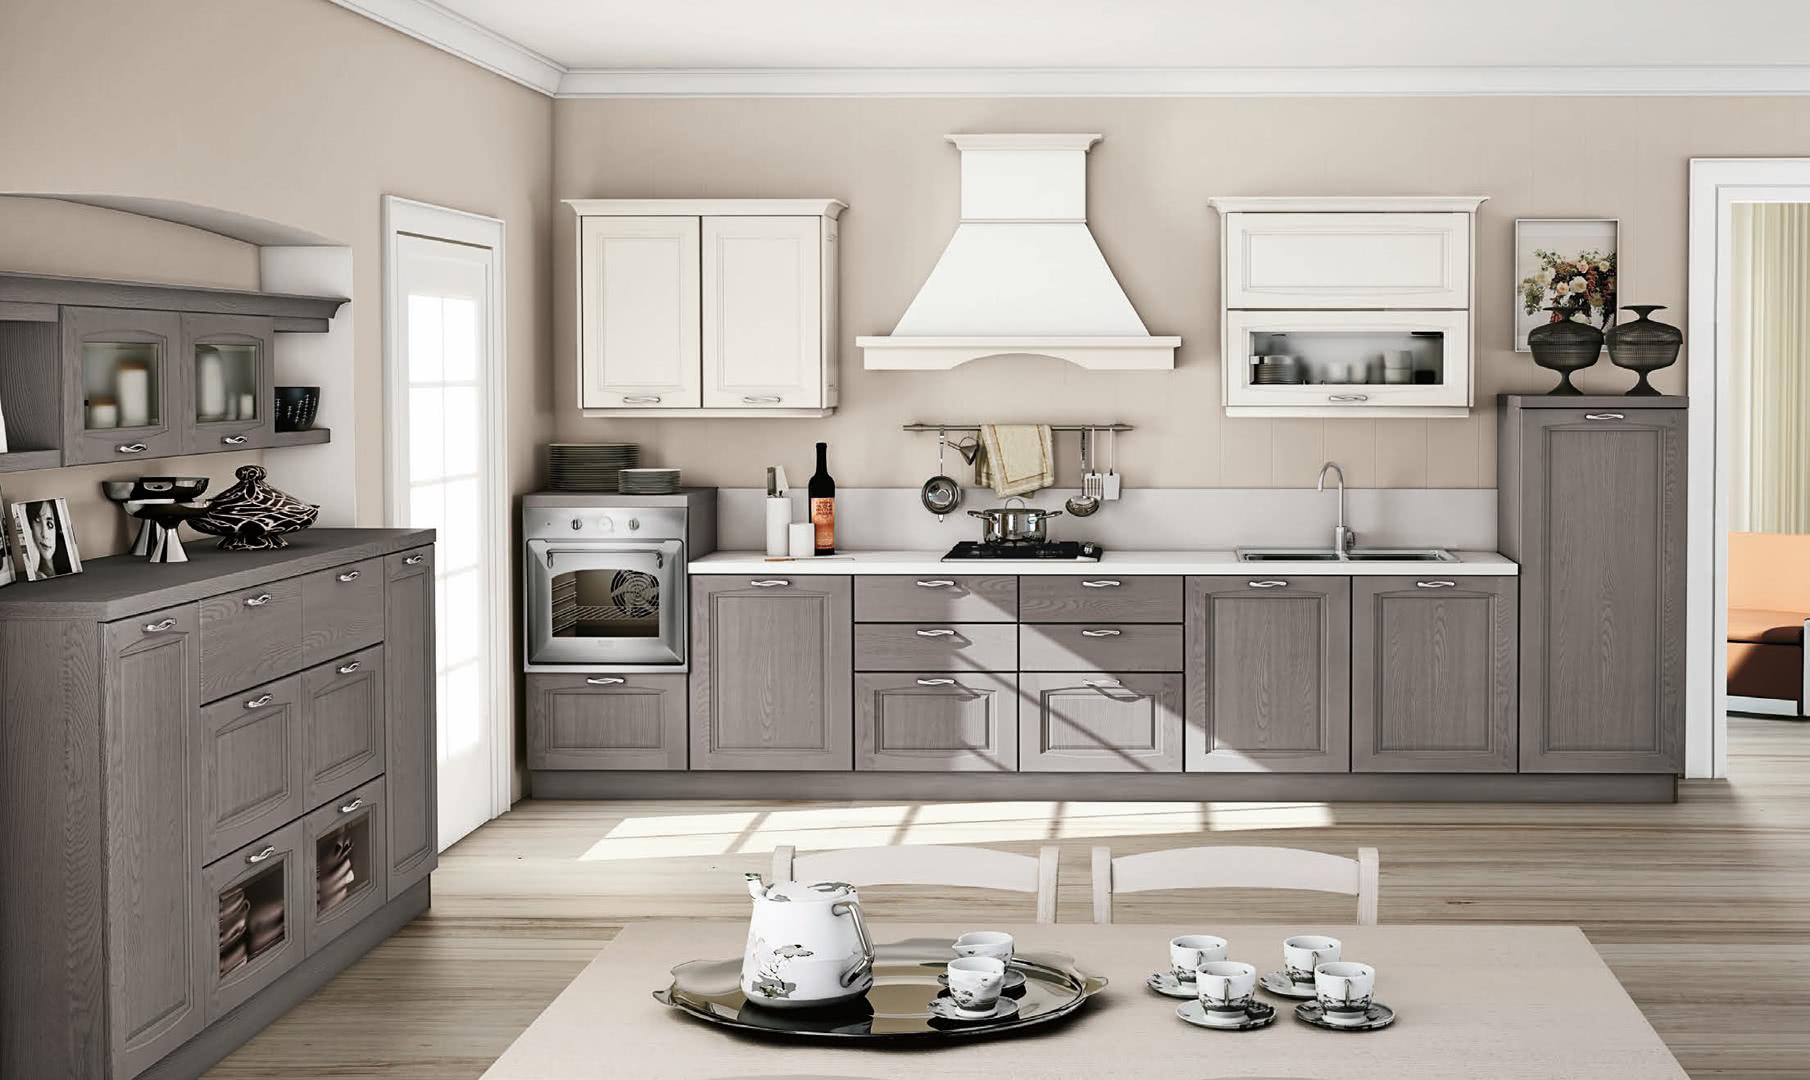 Cucina Classica Lube - Raila Creo Kitchens